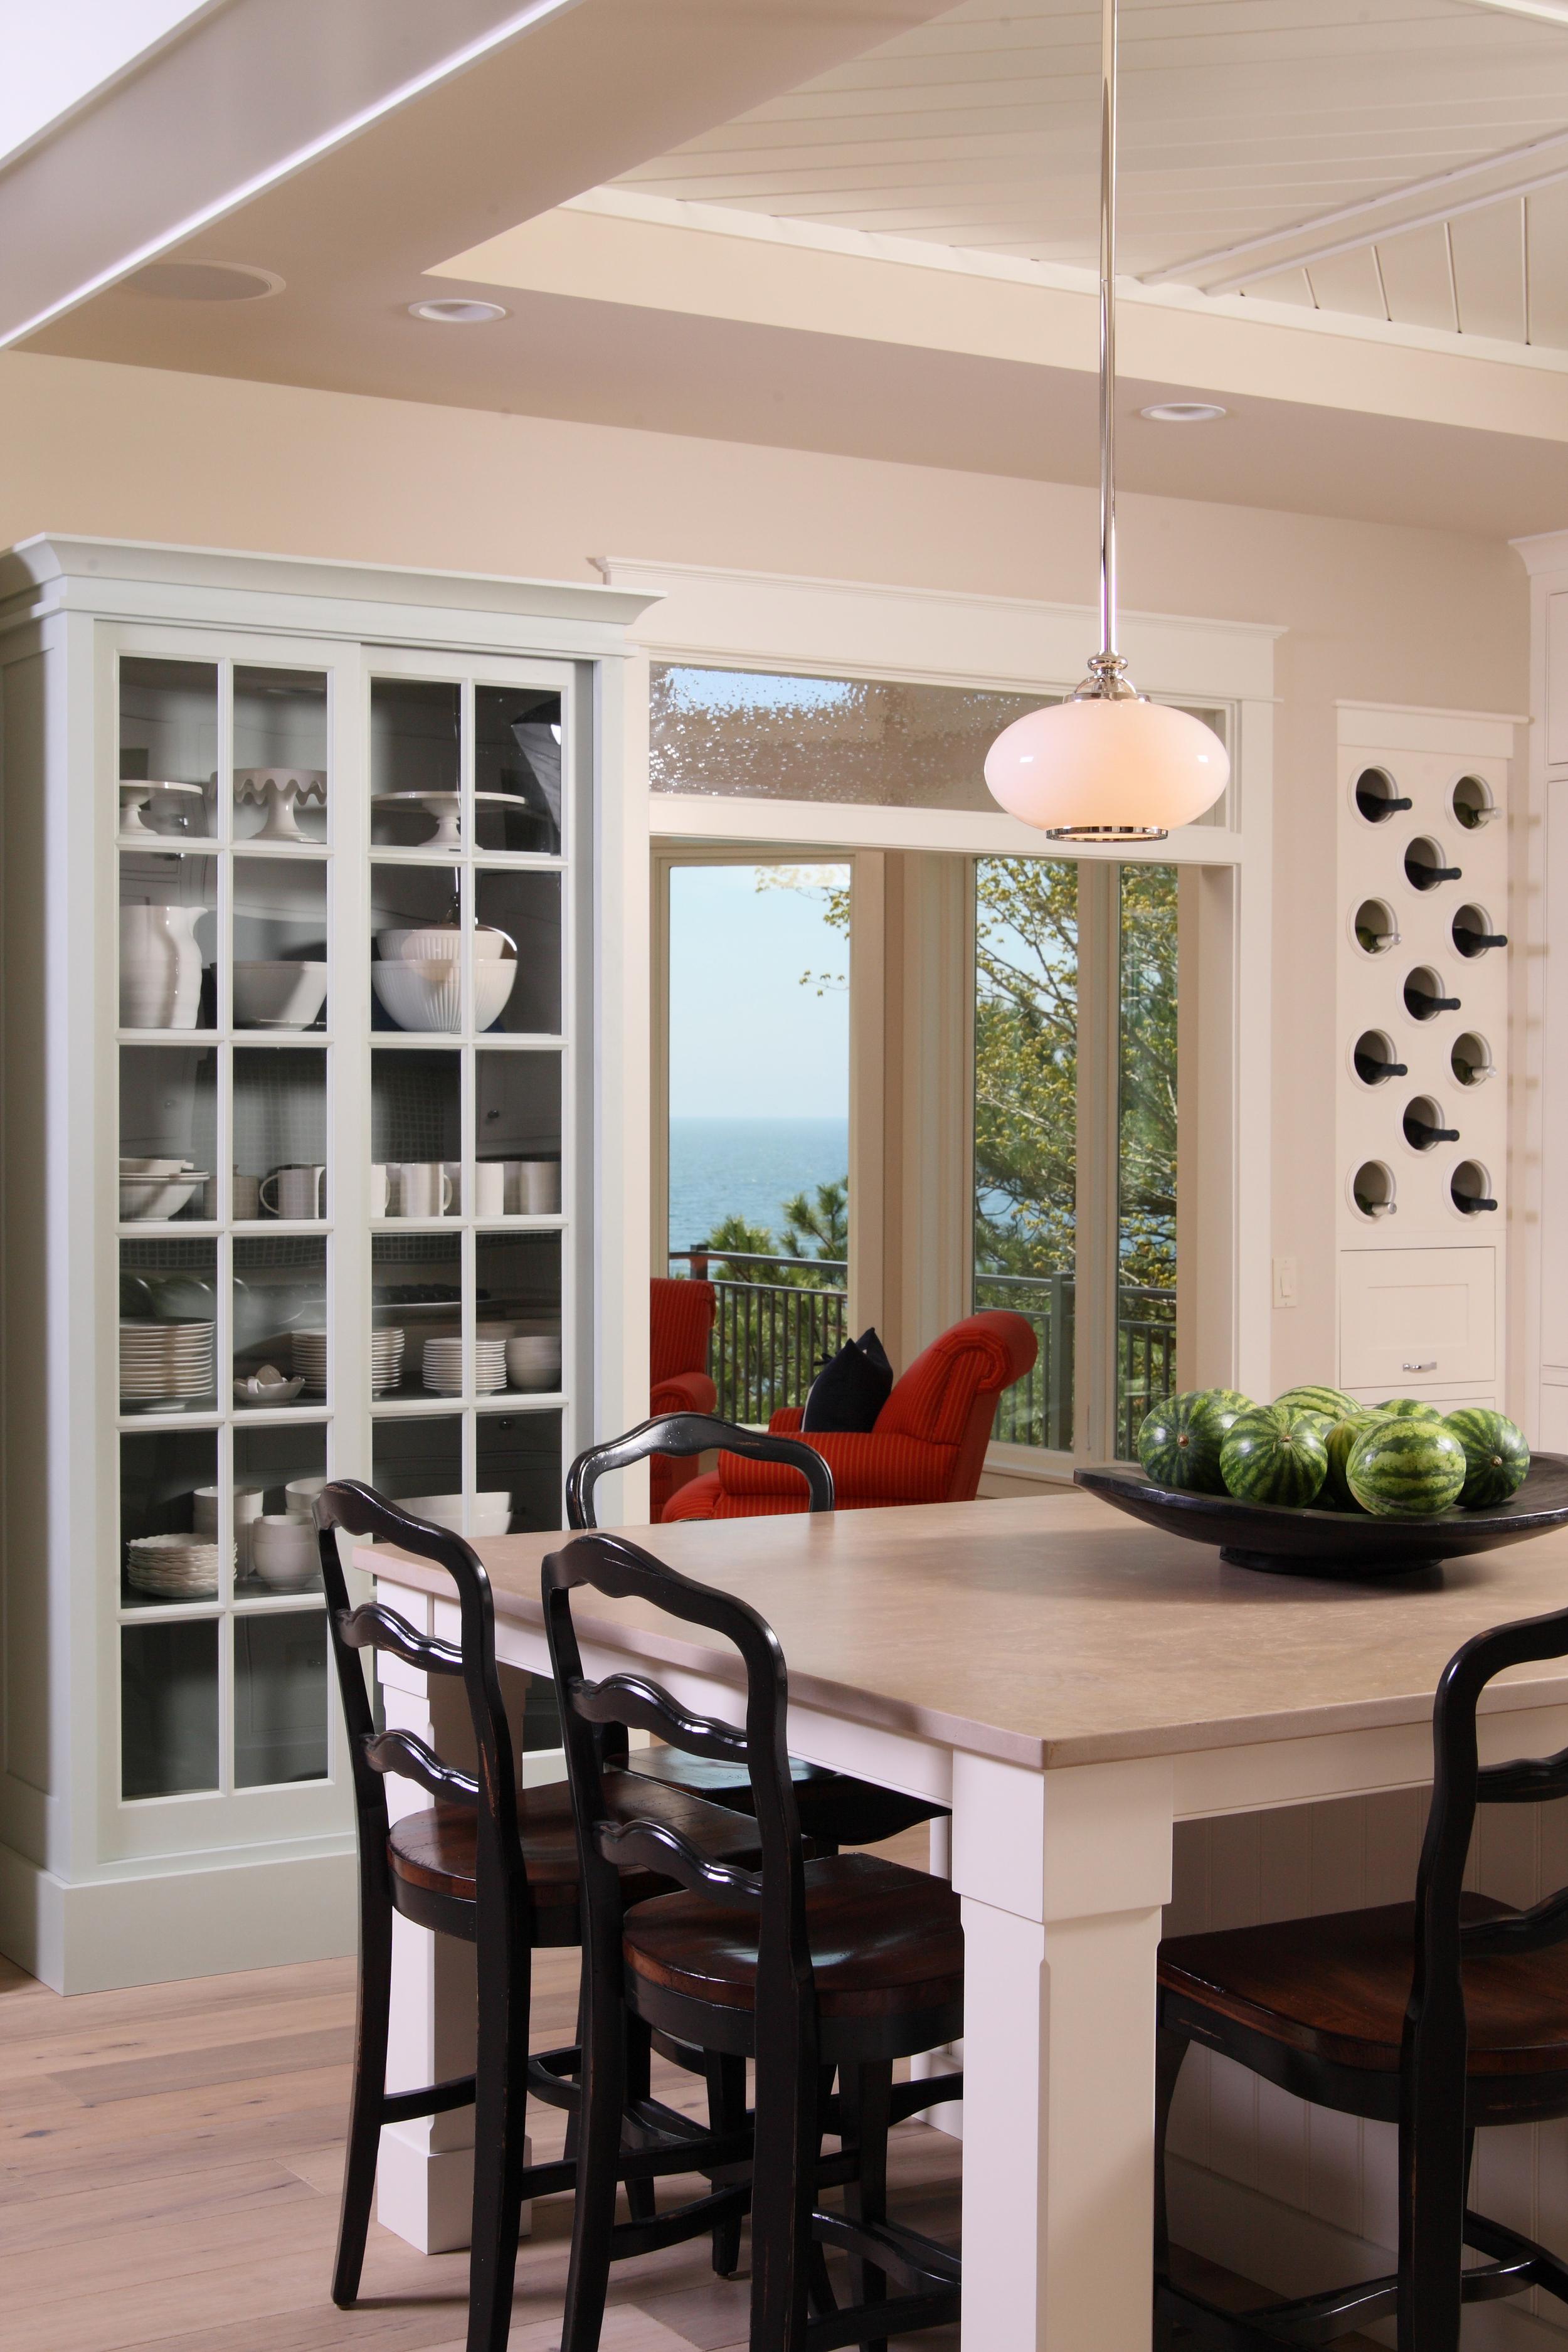 Kitchen Perspective_Design Home 1030.jpg